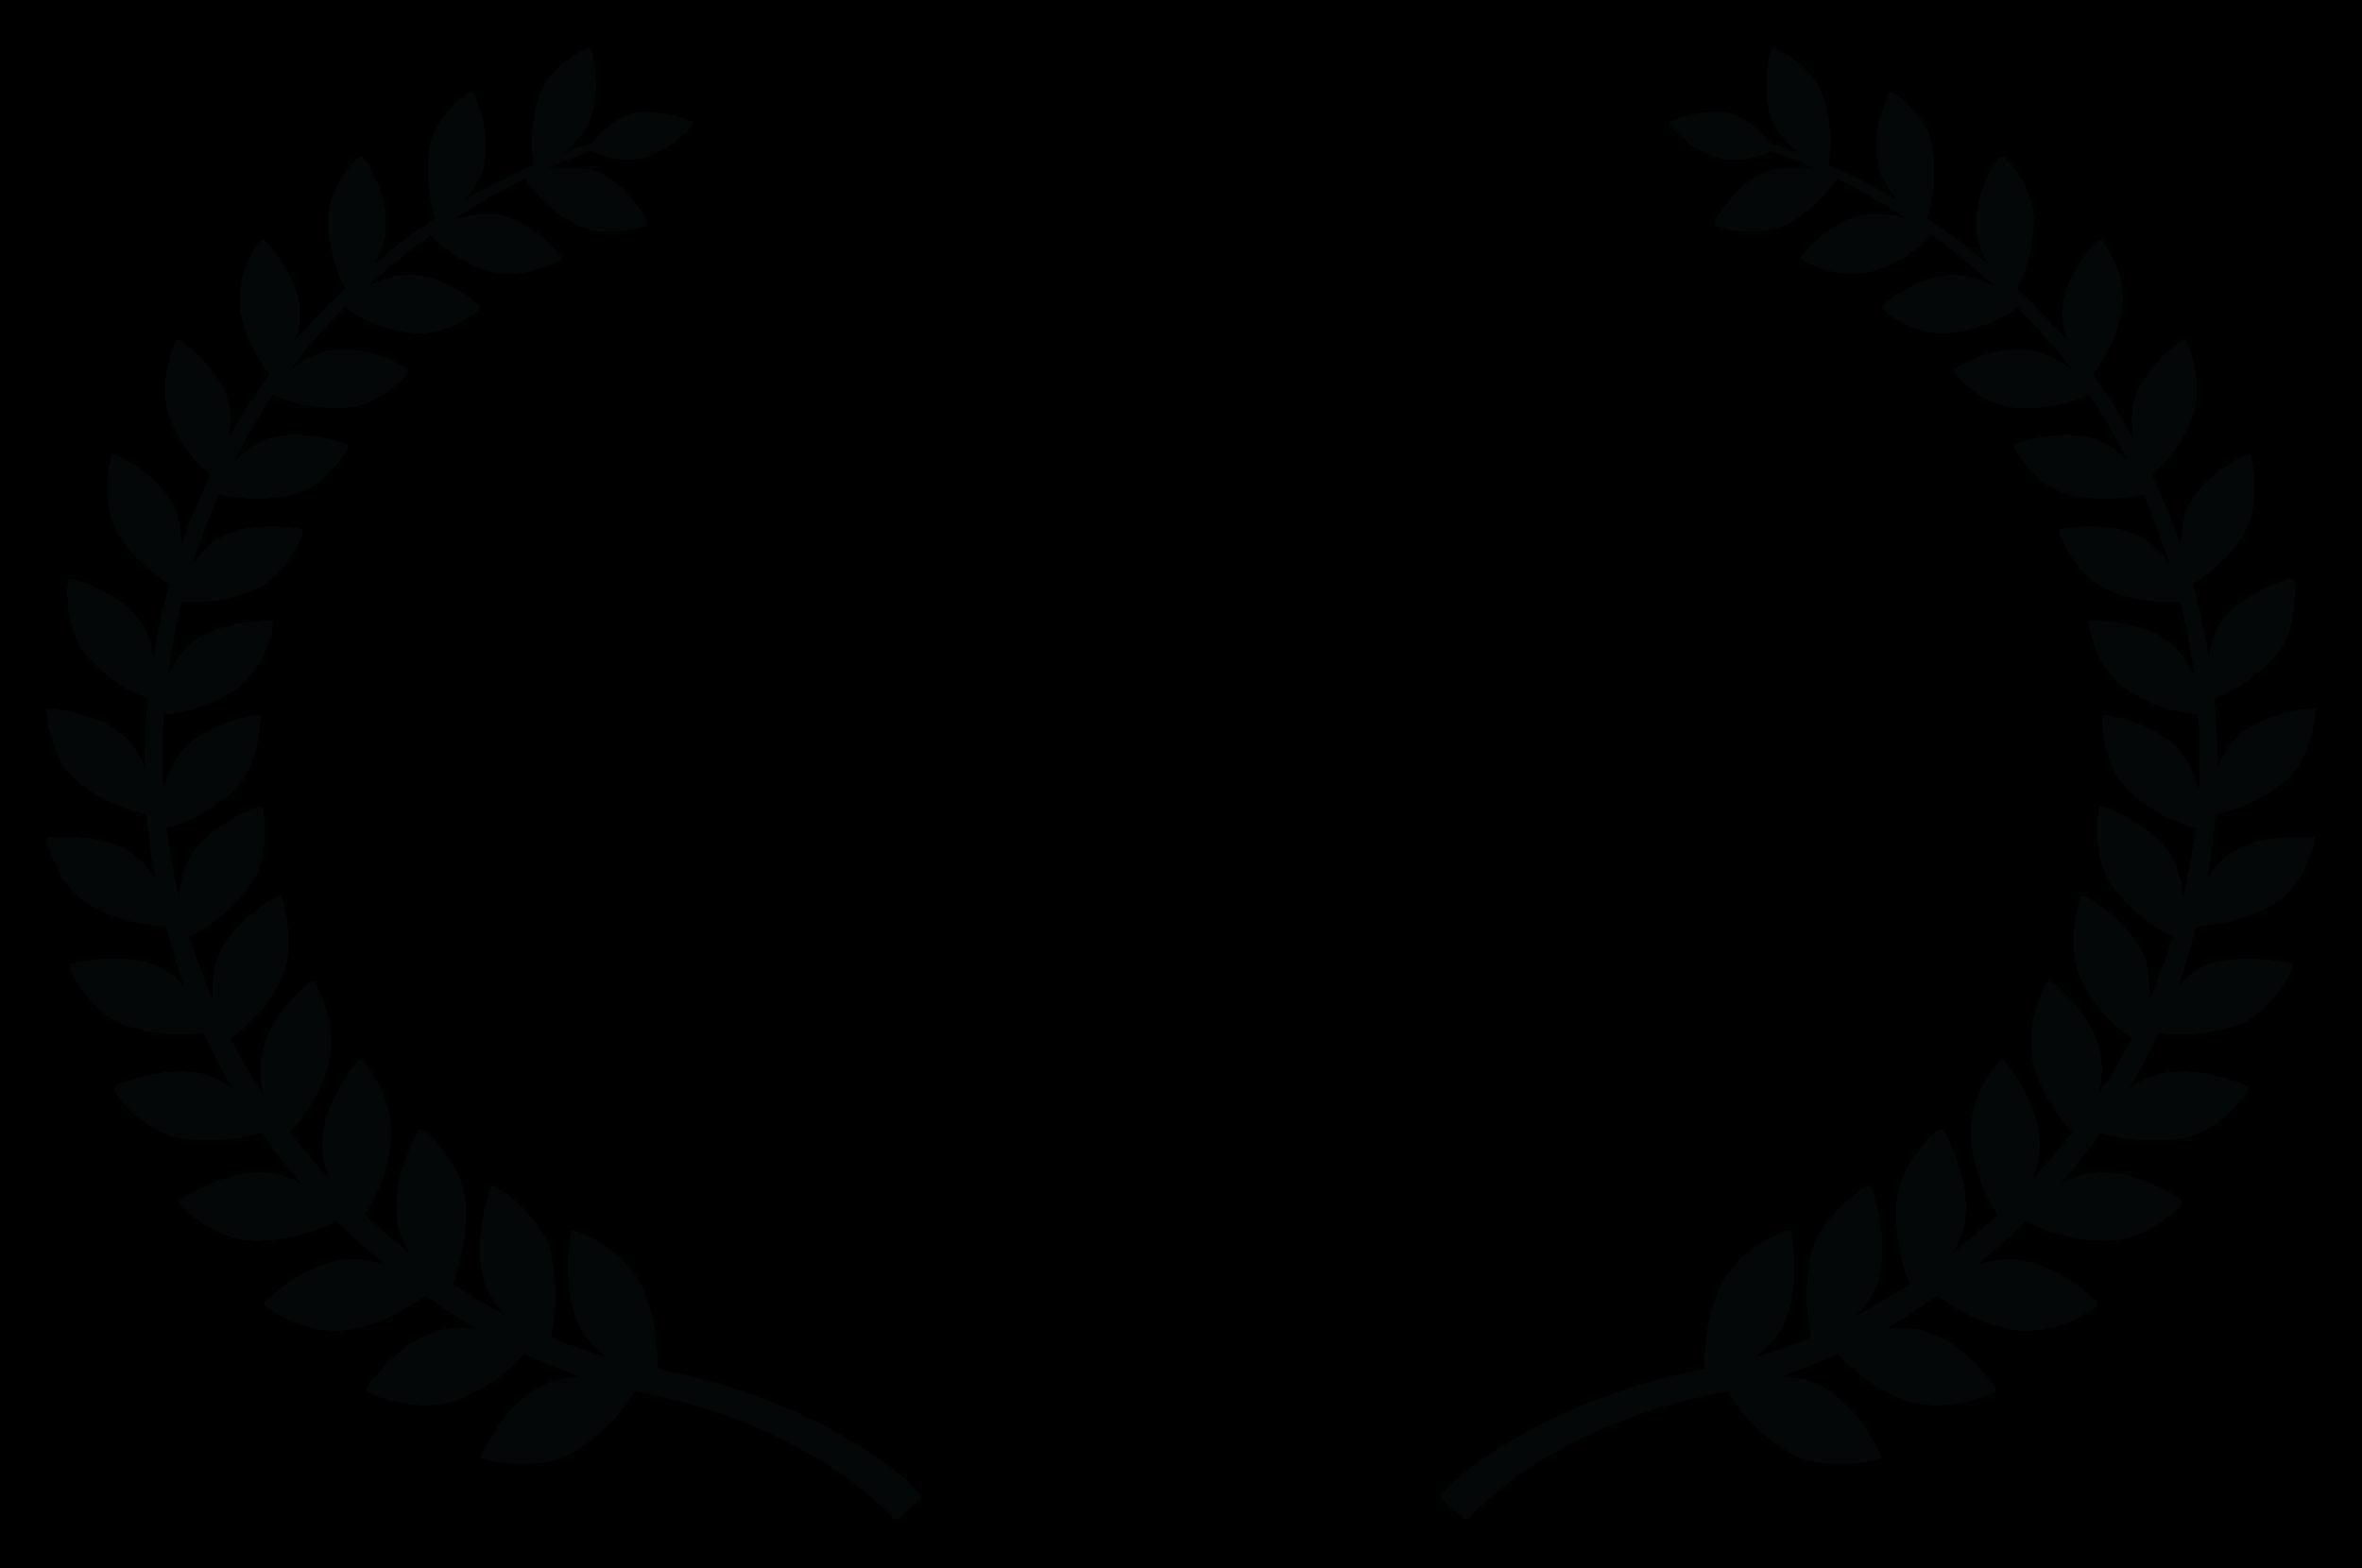 FilmCrash-FirstPrizeExperimentalFilm-2019.png